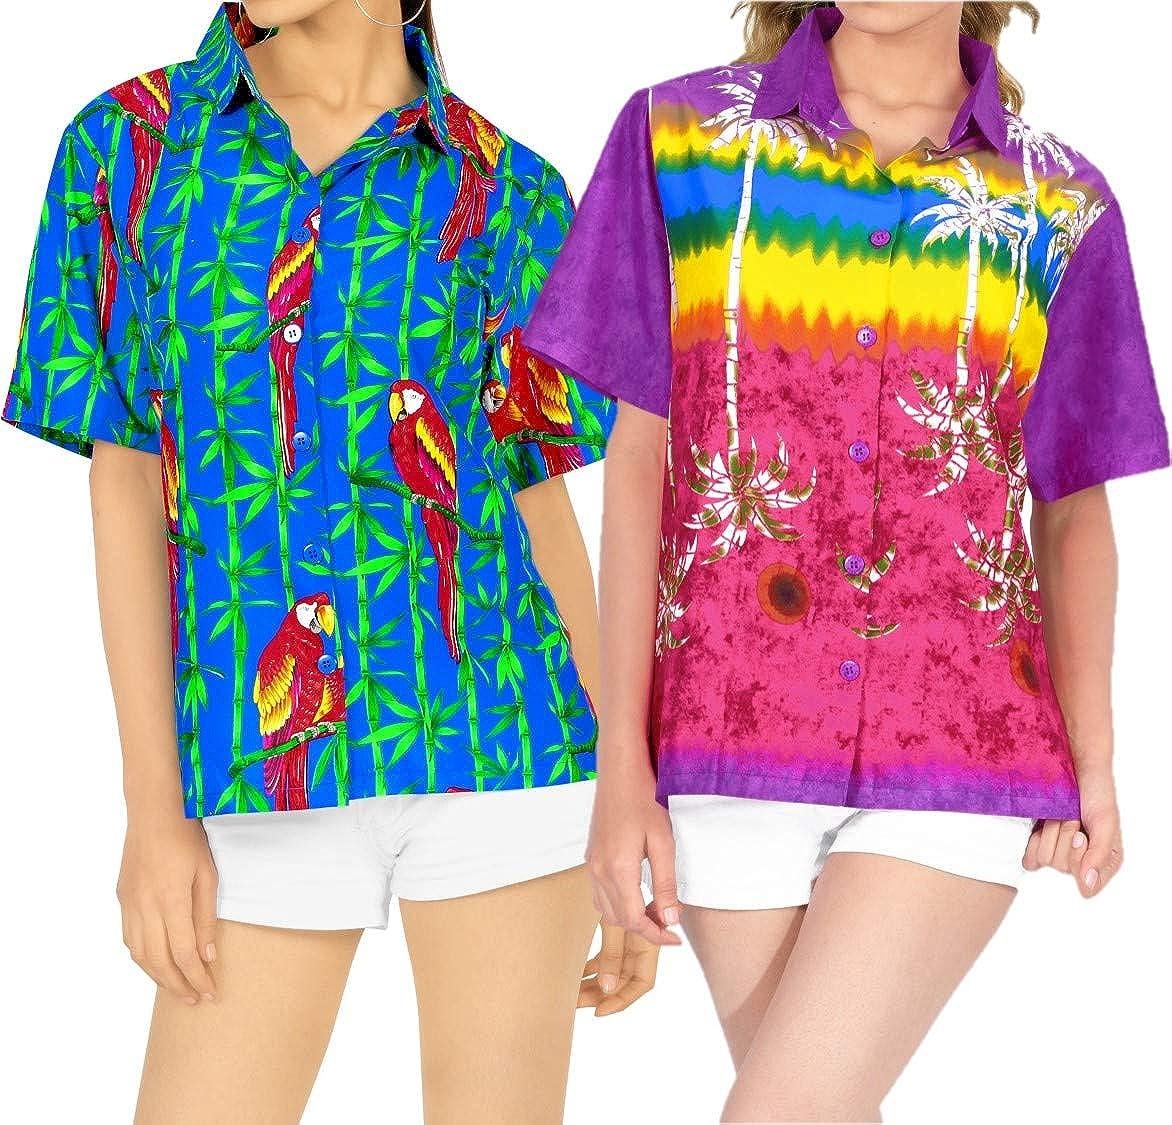 LA LEELA Women's Camp Hawaiian Blouse Shirt Button Down Up Swim Wear Work from Home Clothes Women Beach Shirt Blouse Shirt Combo Pack of 2 Size M